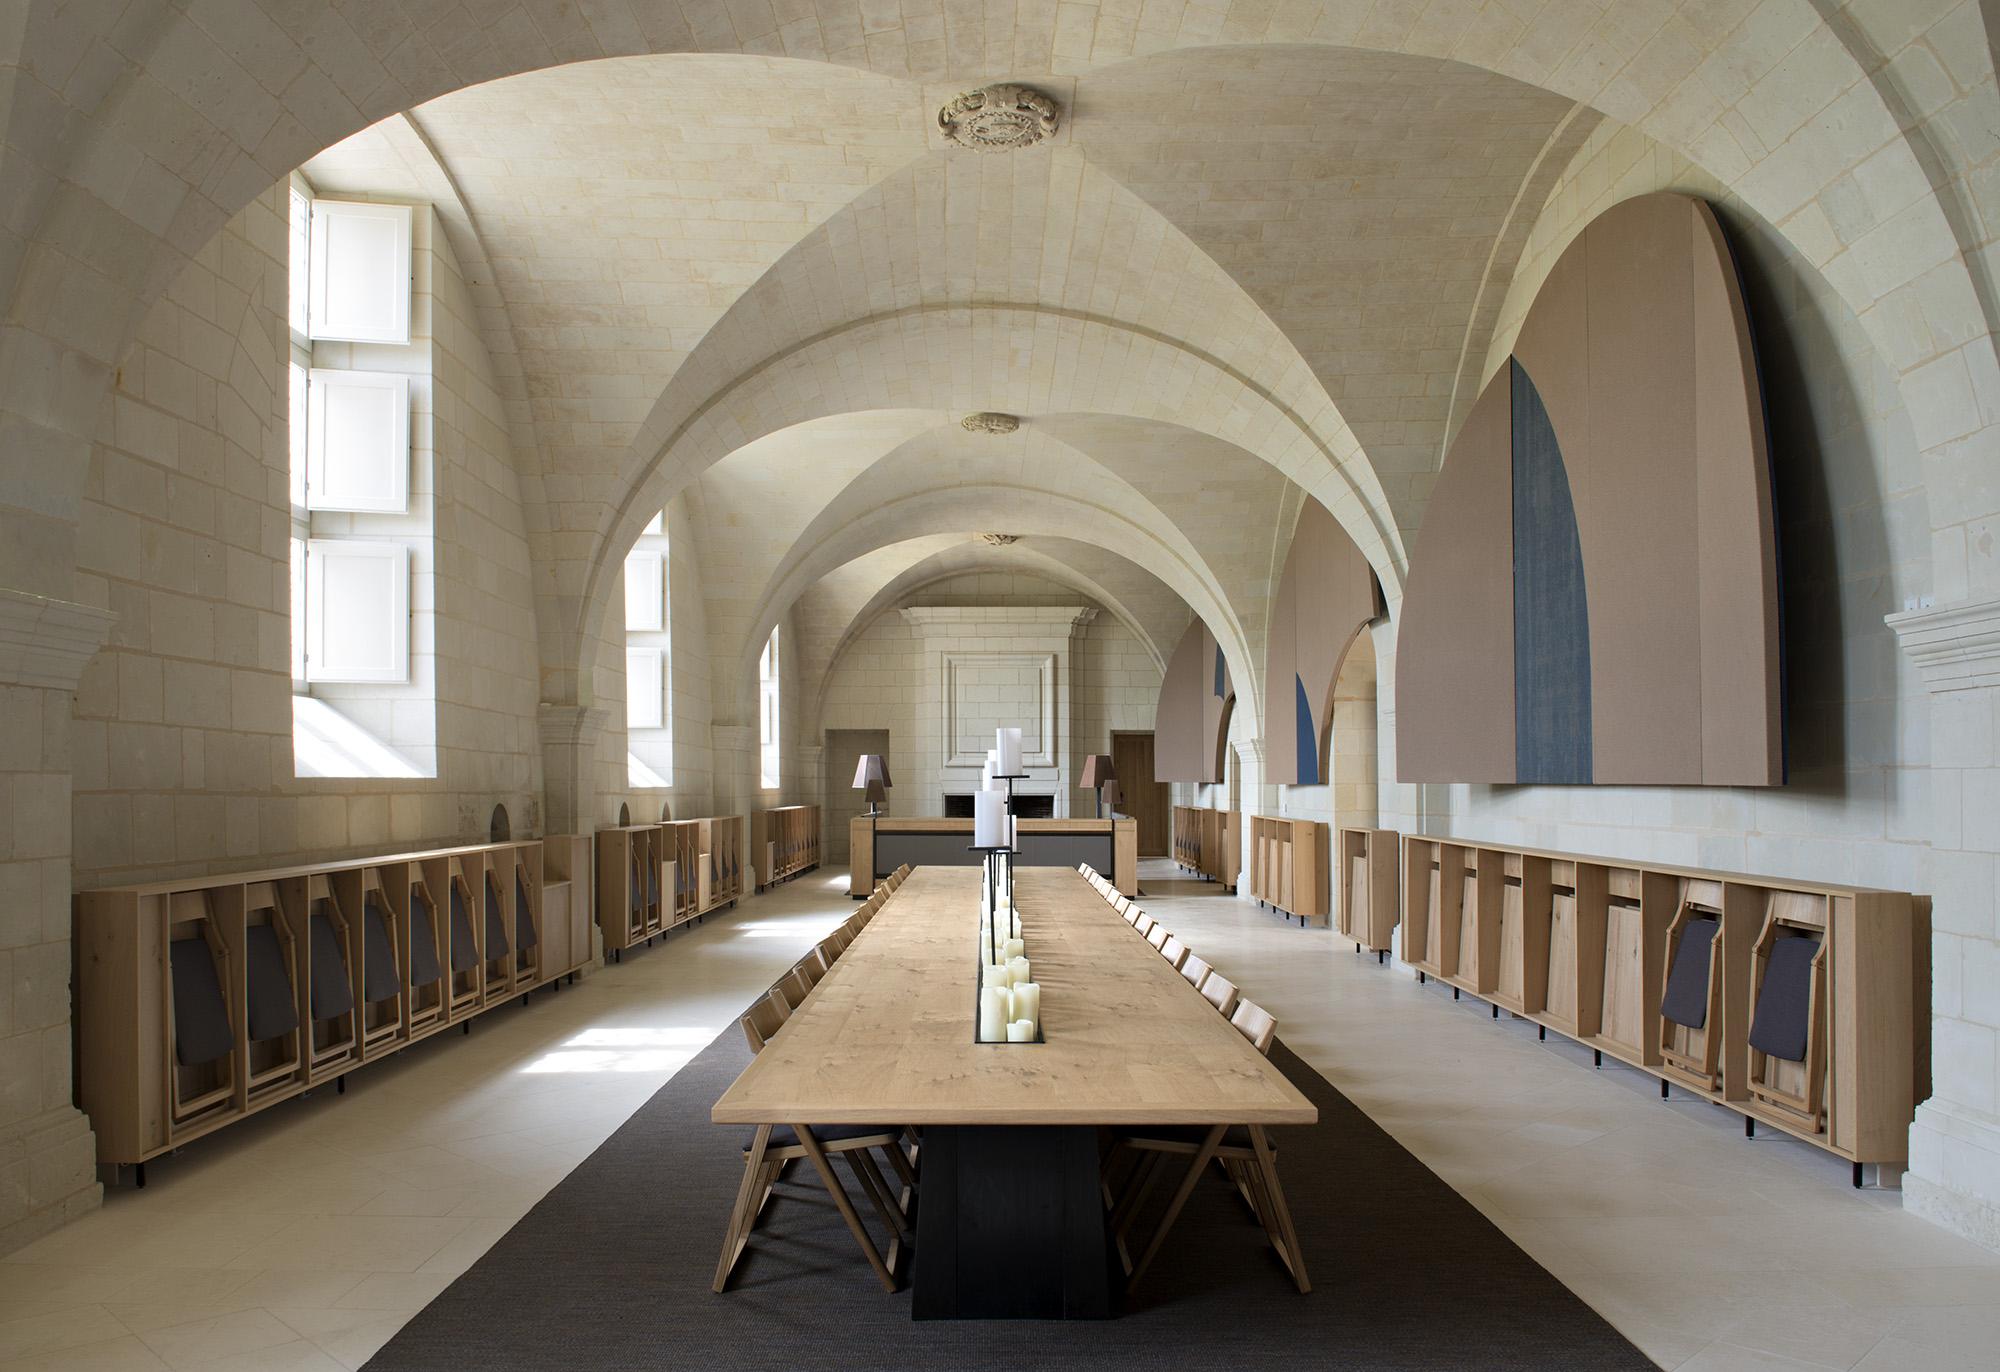 heavenly monastery hotel in france hero and leander. Black Bedroom Furniture Sets. Home Design Ideas